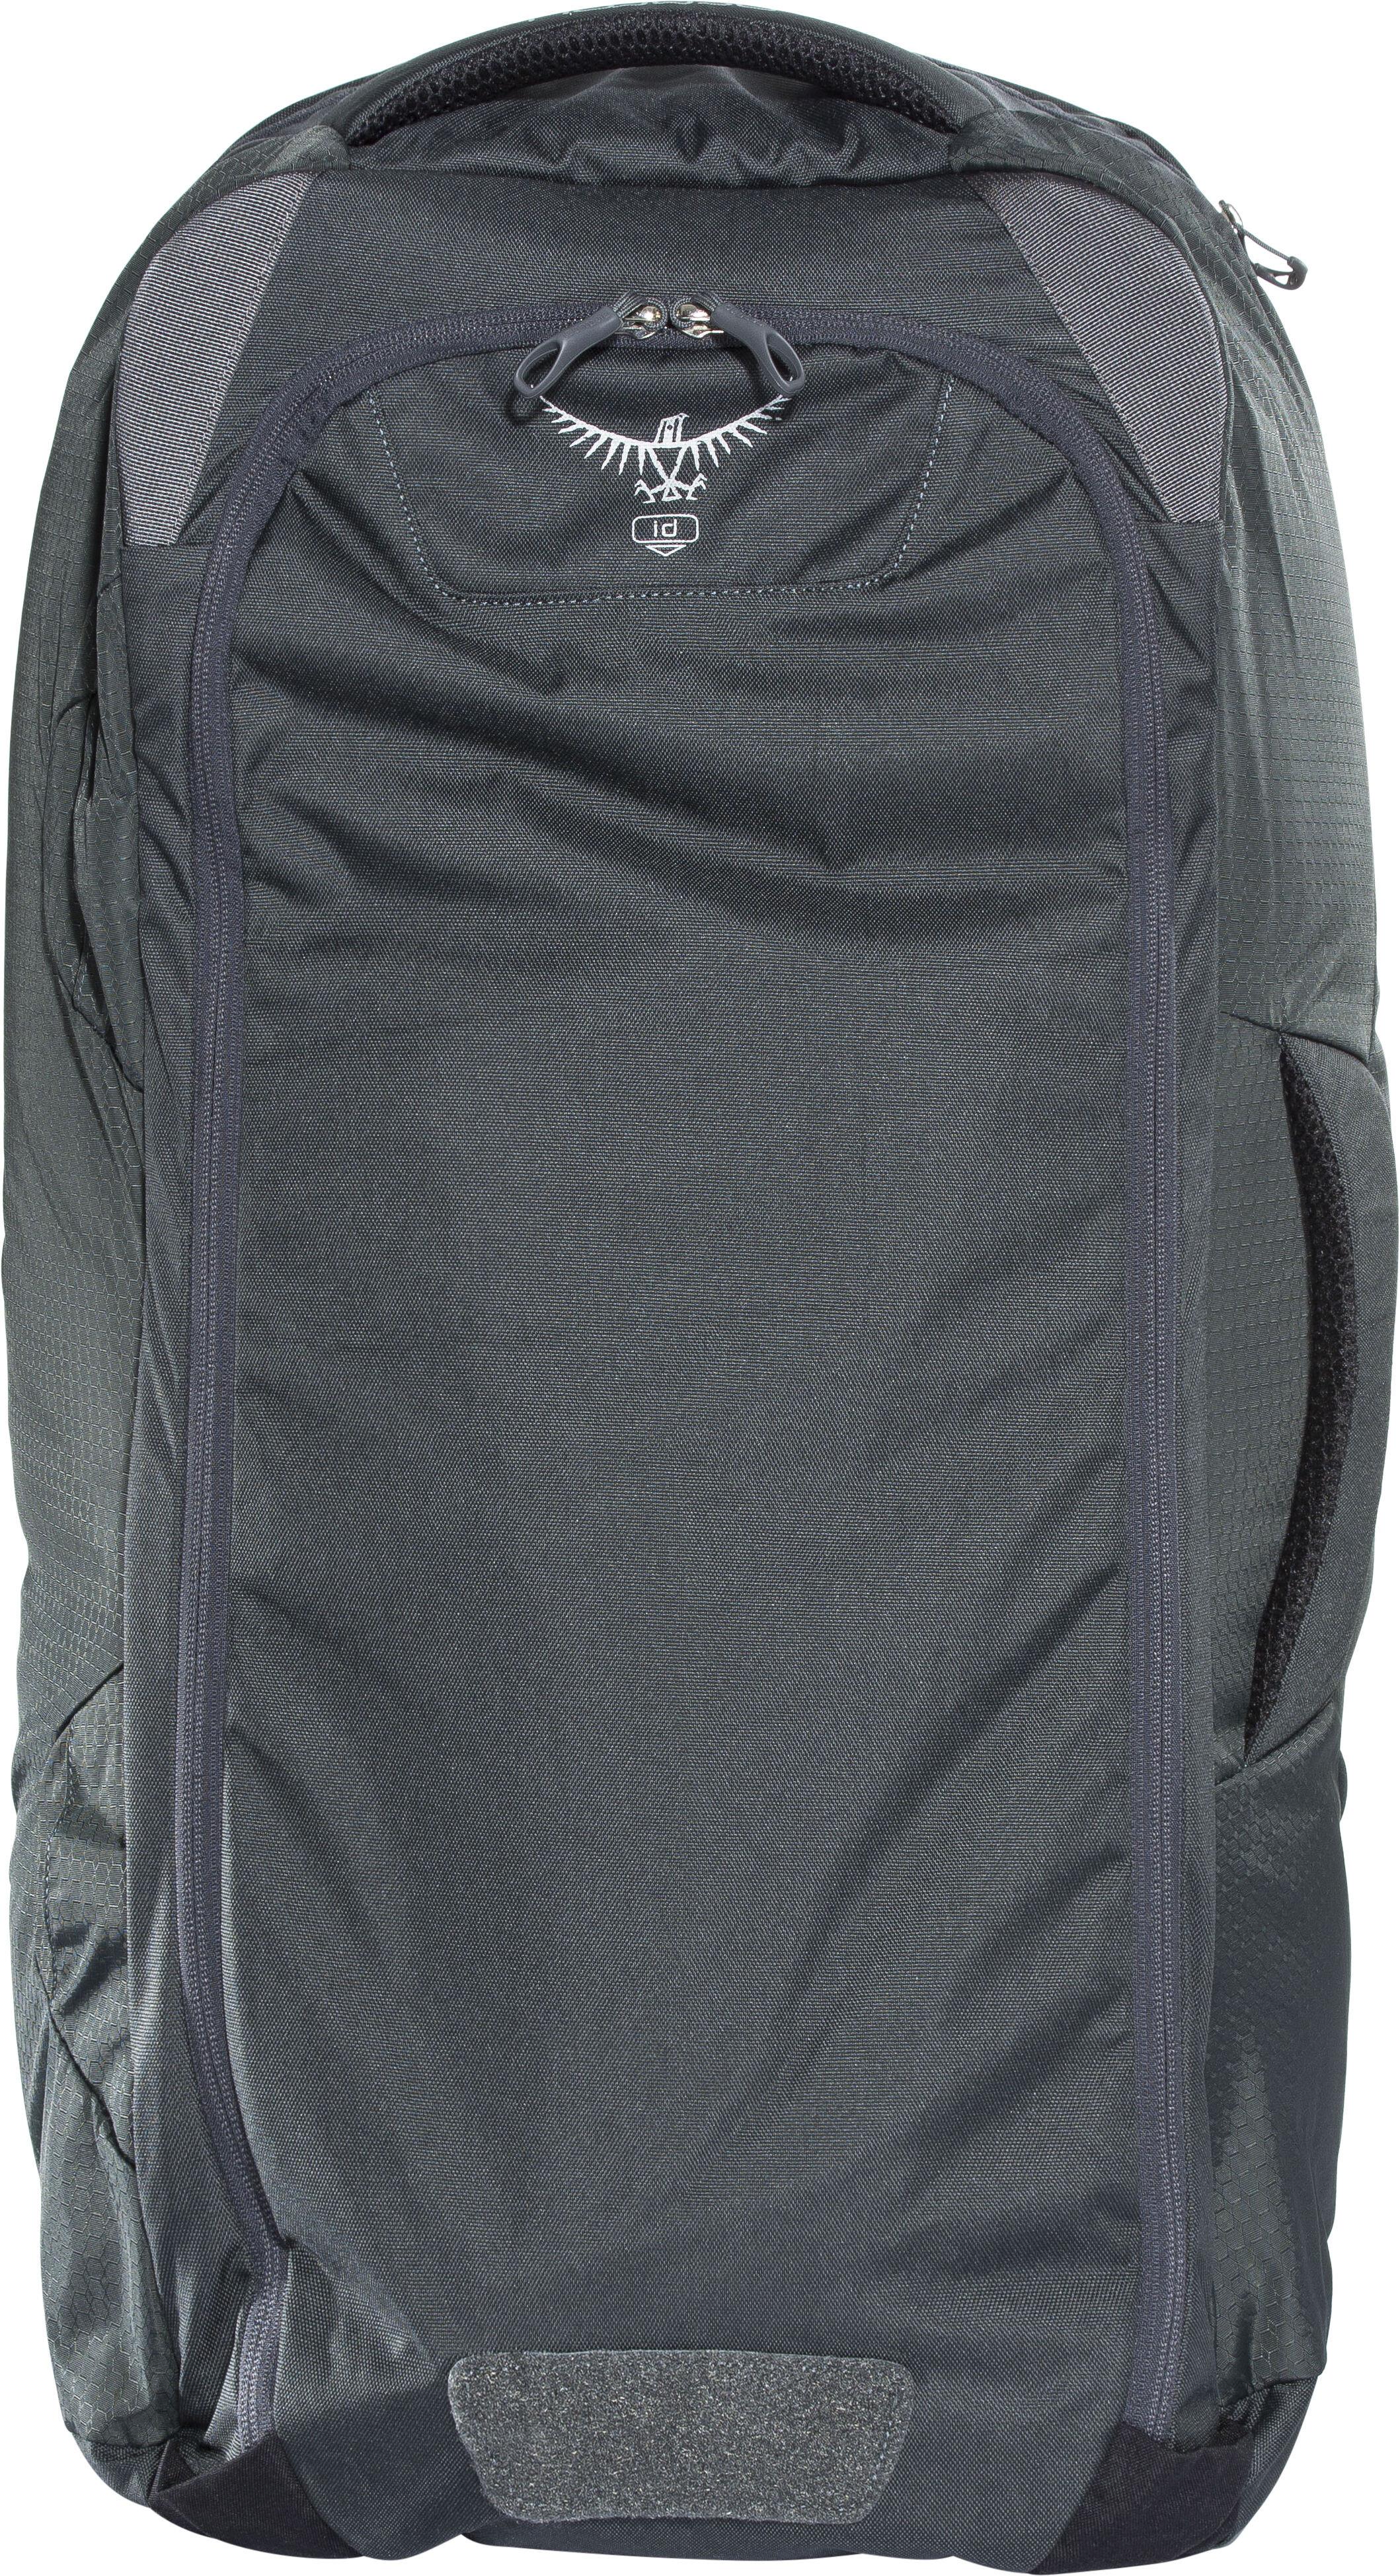 Wildcraft Shuttle Travel Duffle Bag Price  cc1b46474cb08